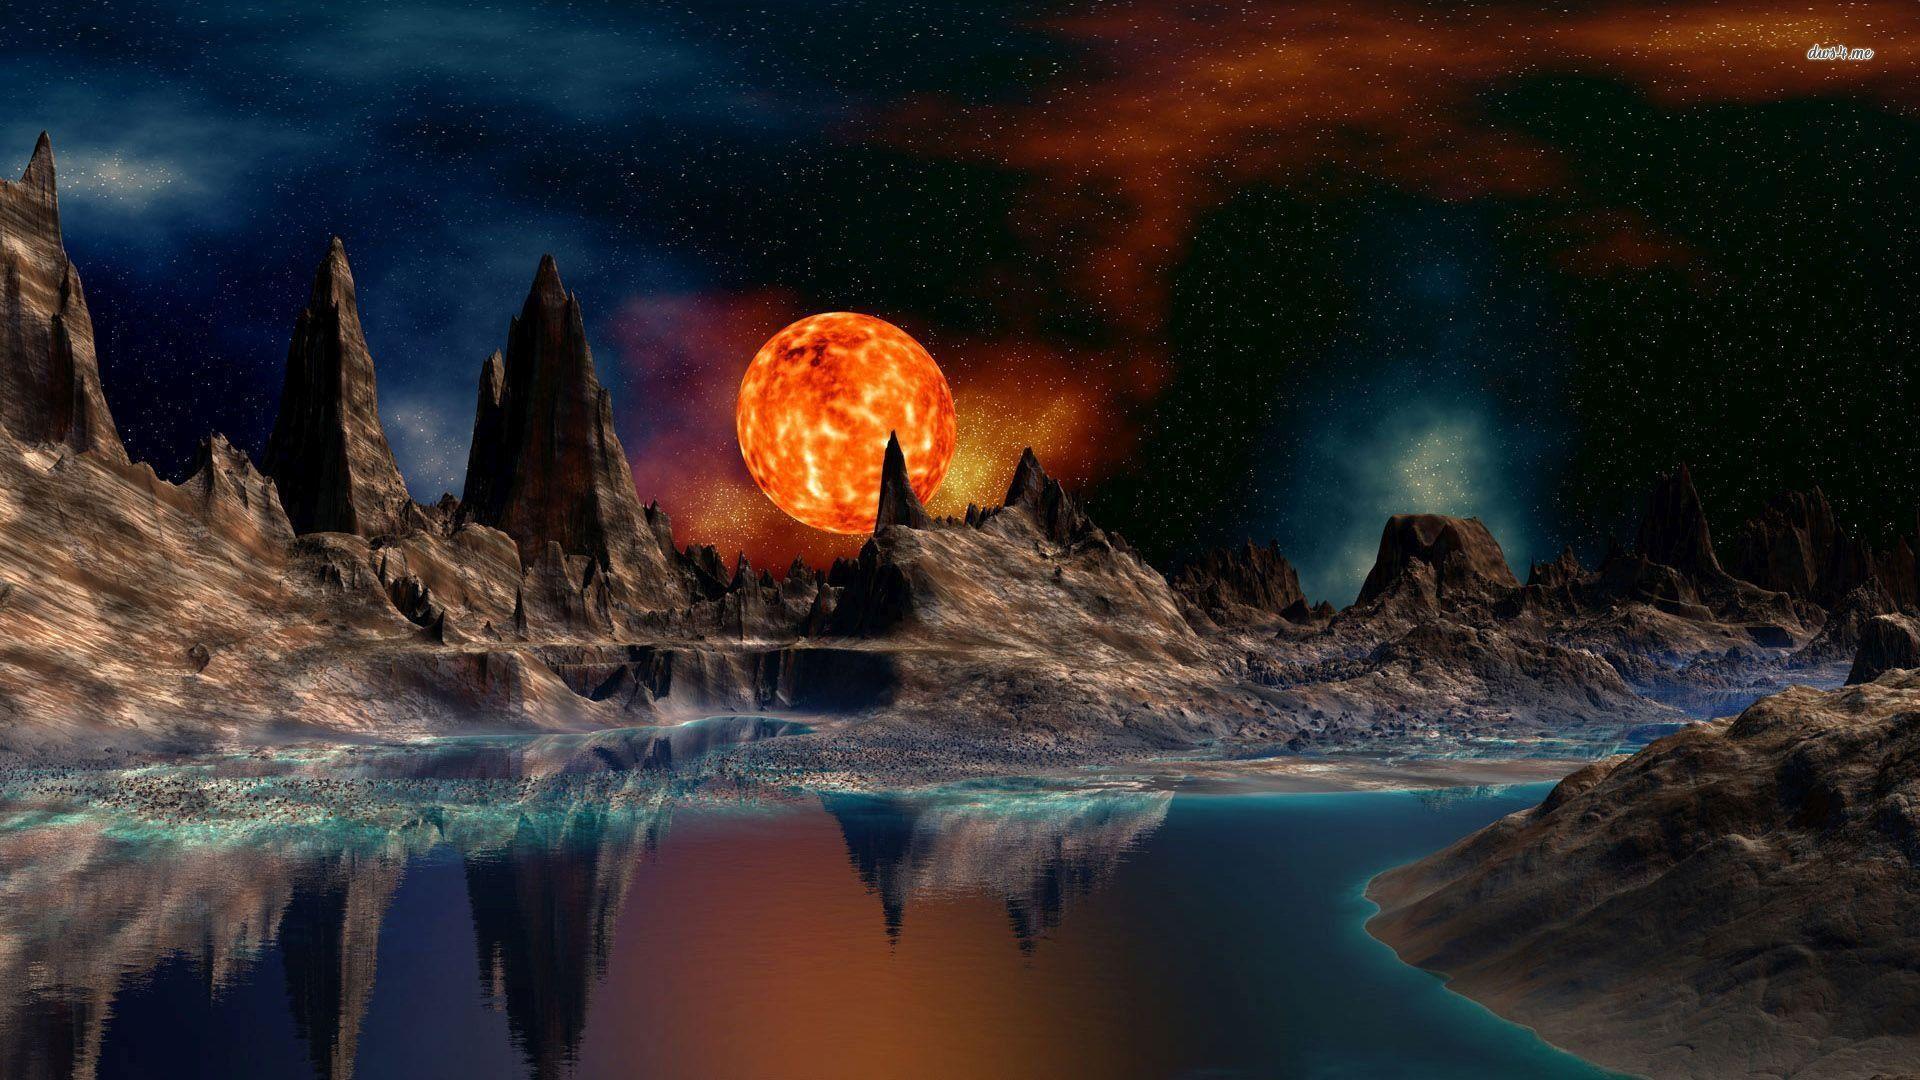 خلفيات سطح المكتب Hd ويندوز 10 Tecnologis Moon Artwork Fantasy Background Images